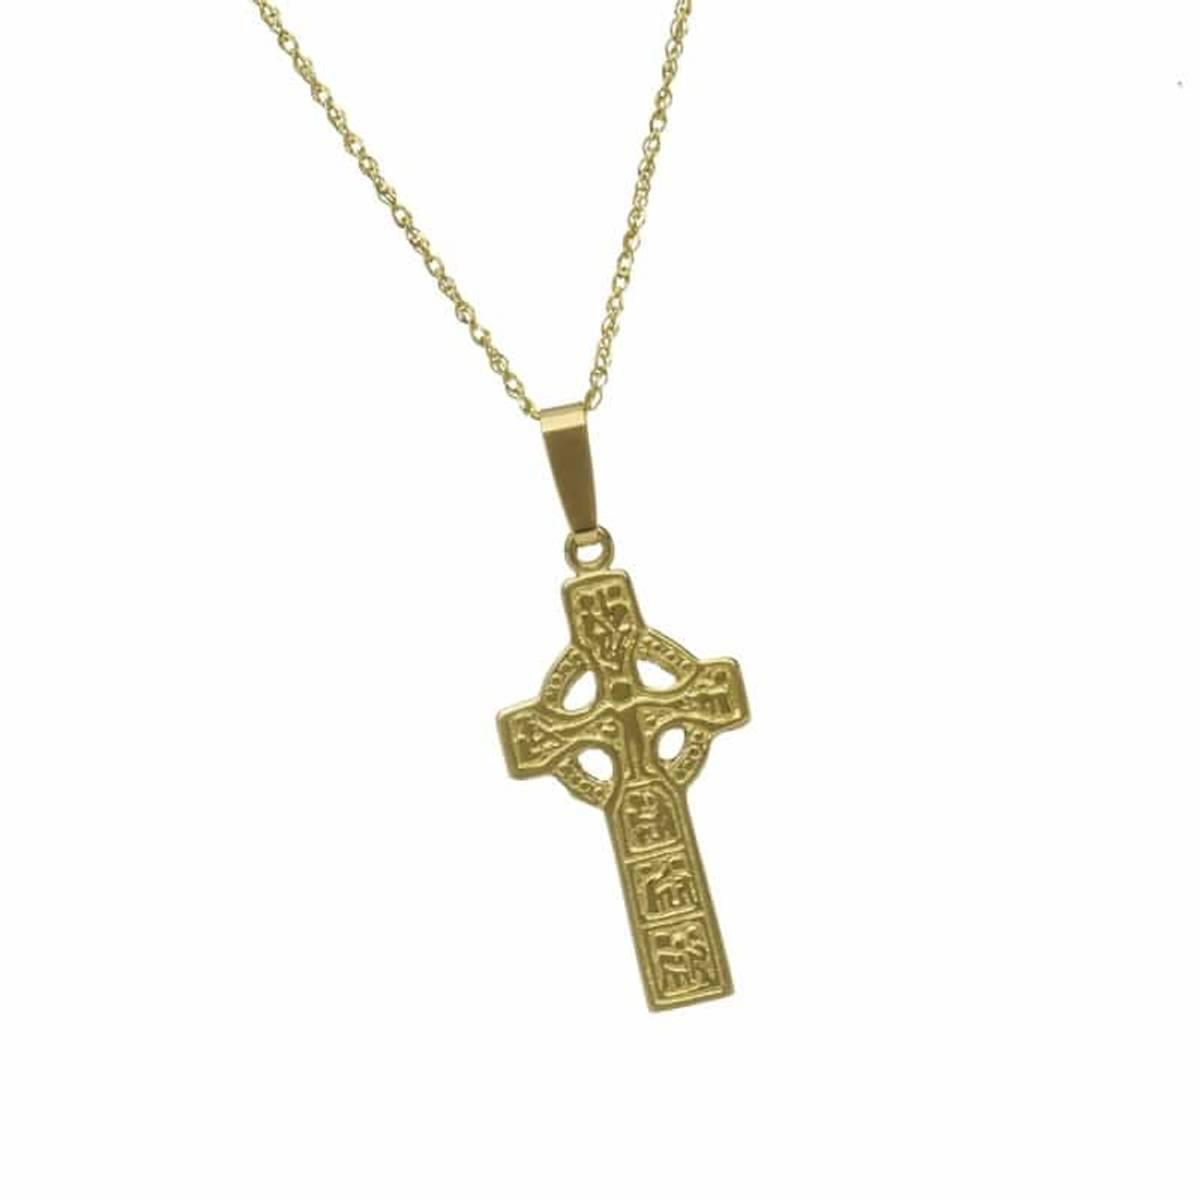 10 ct gold Duleek replica cross pendant